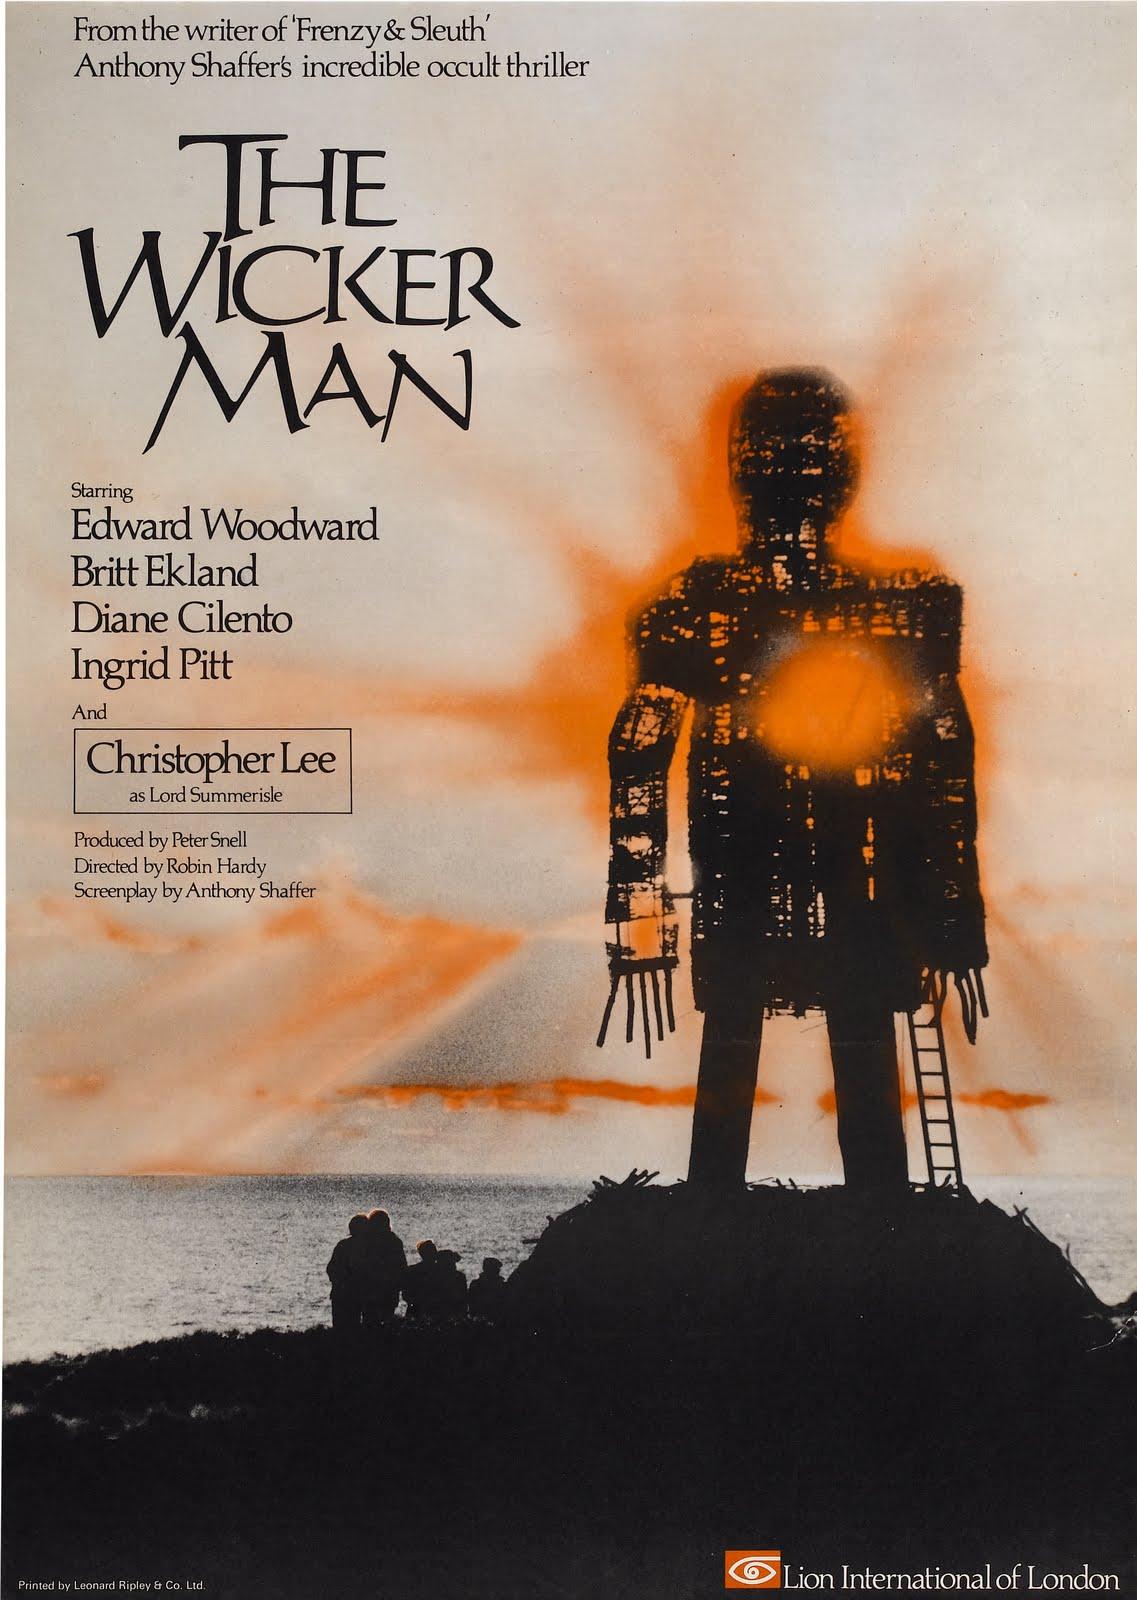 Wicker man movie sex scenes